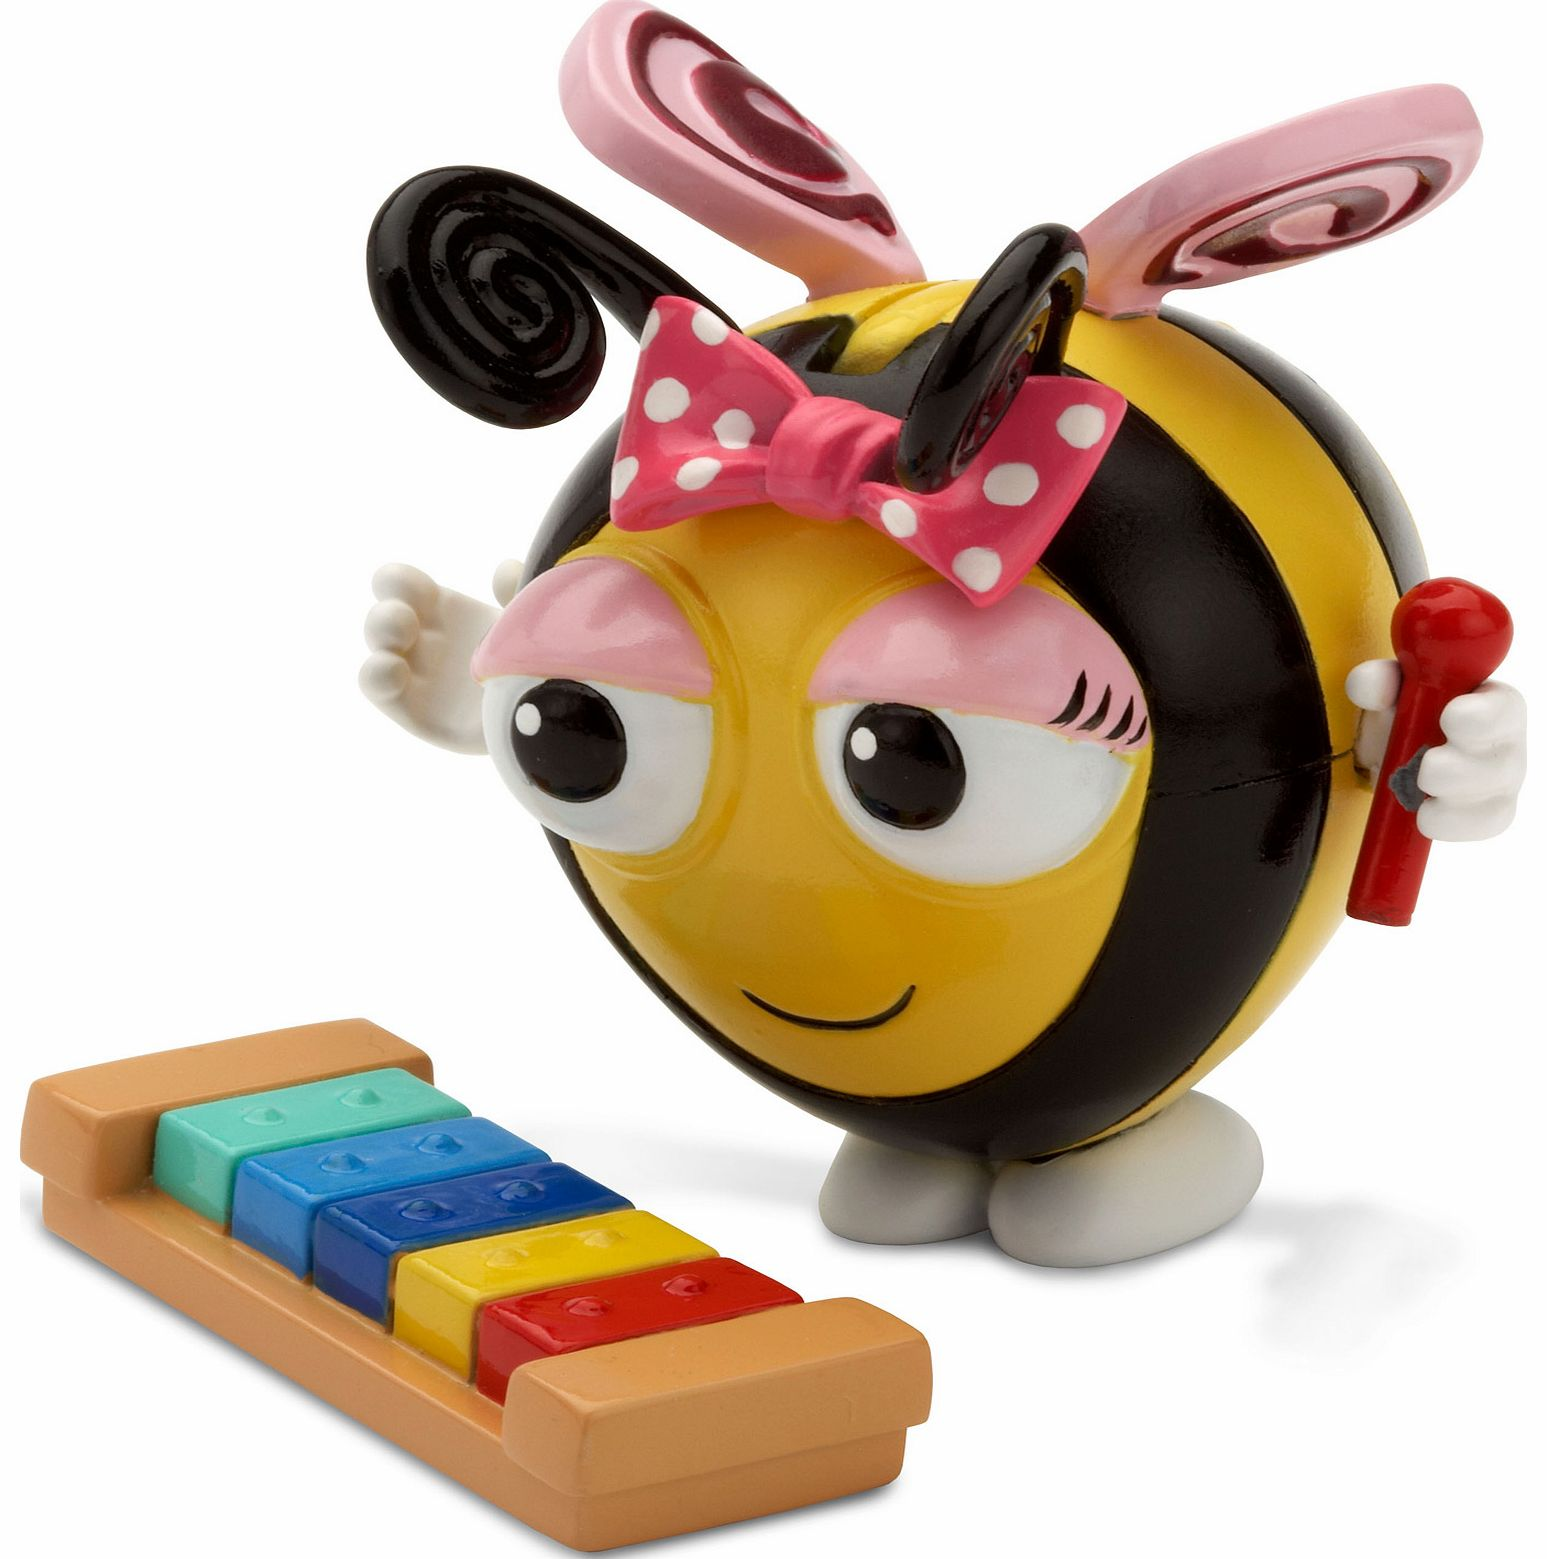 Disney Childs Toys Reviews